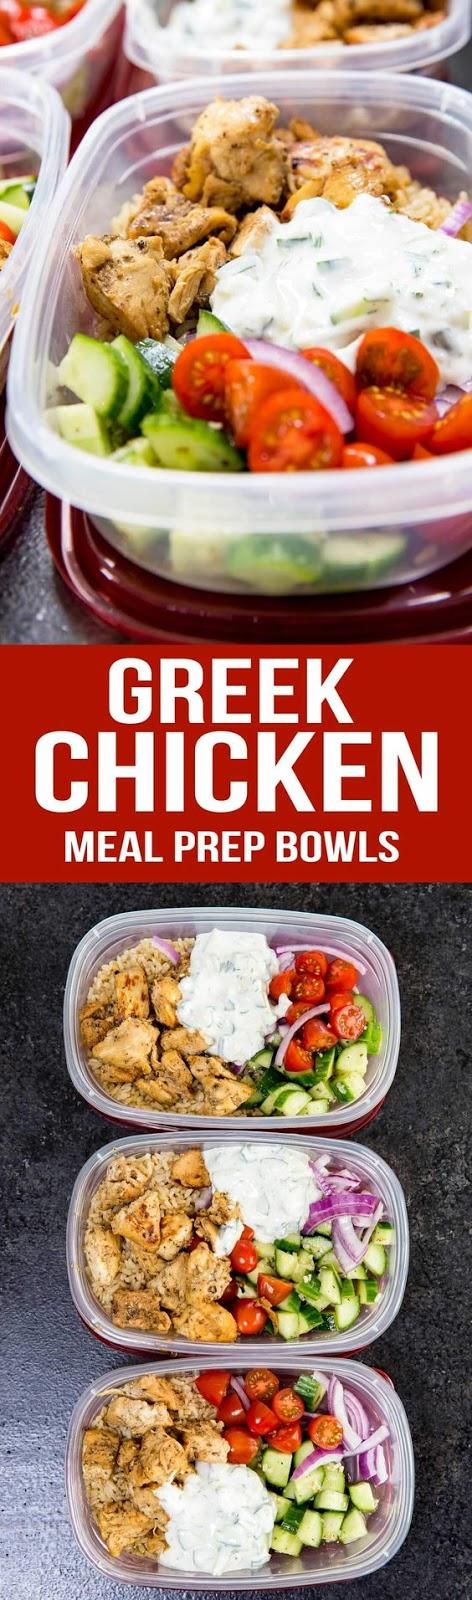 Greek Chícken Bowls (Meal Prep Easy)